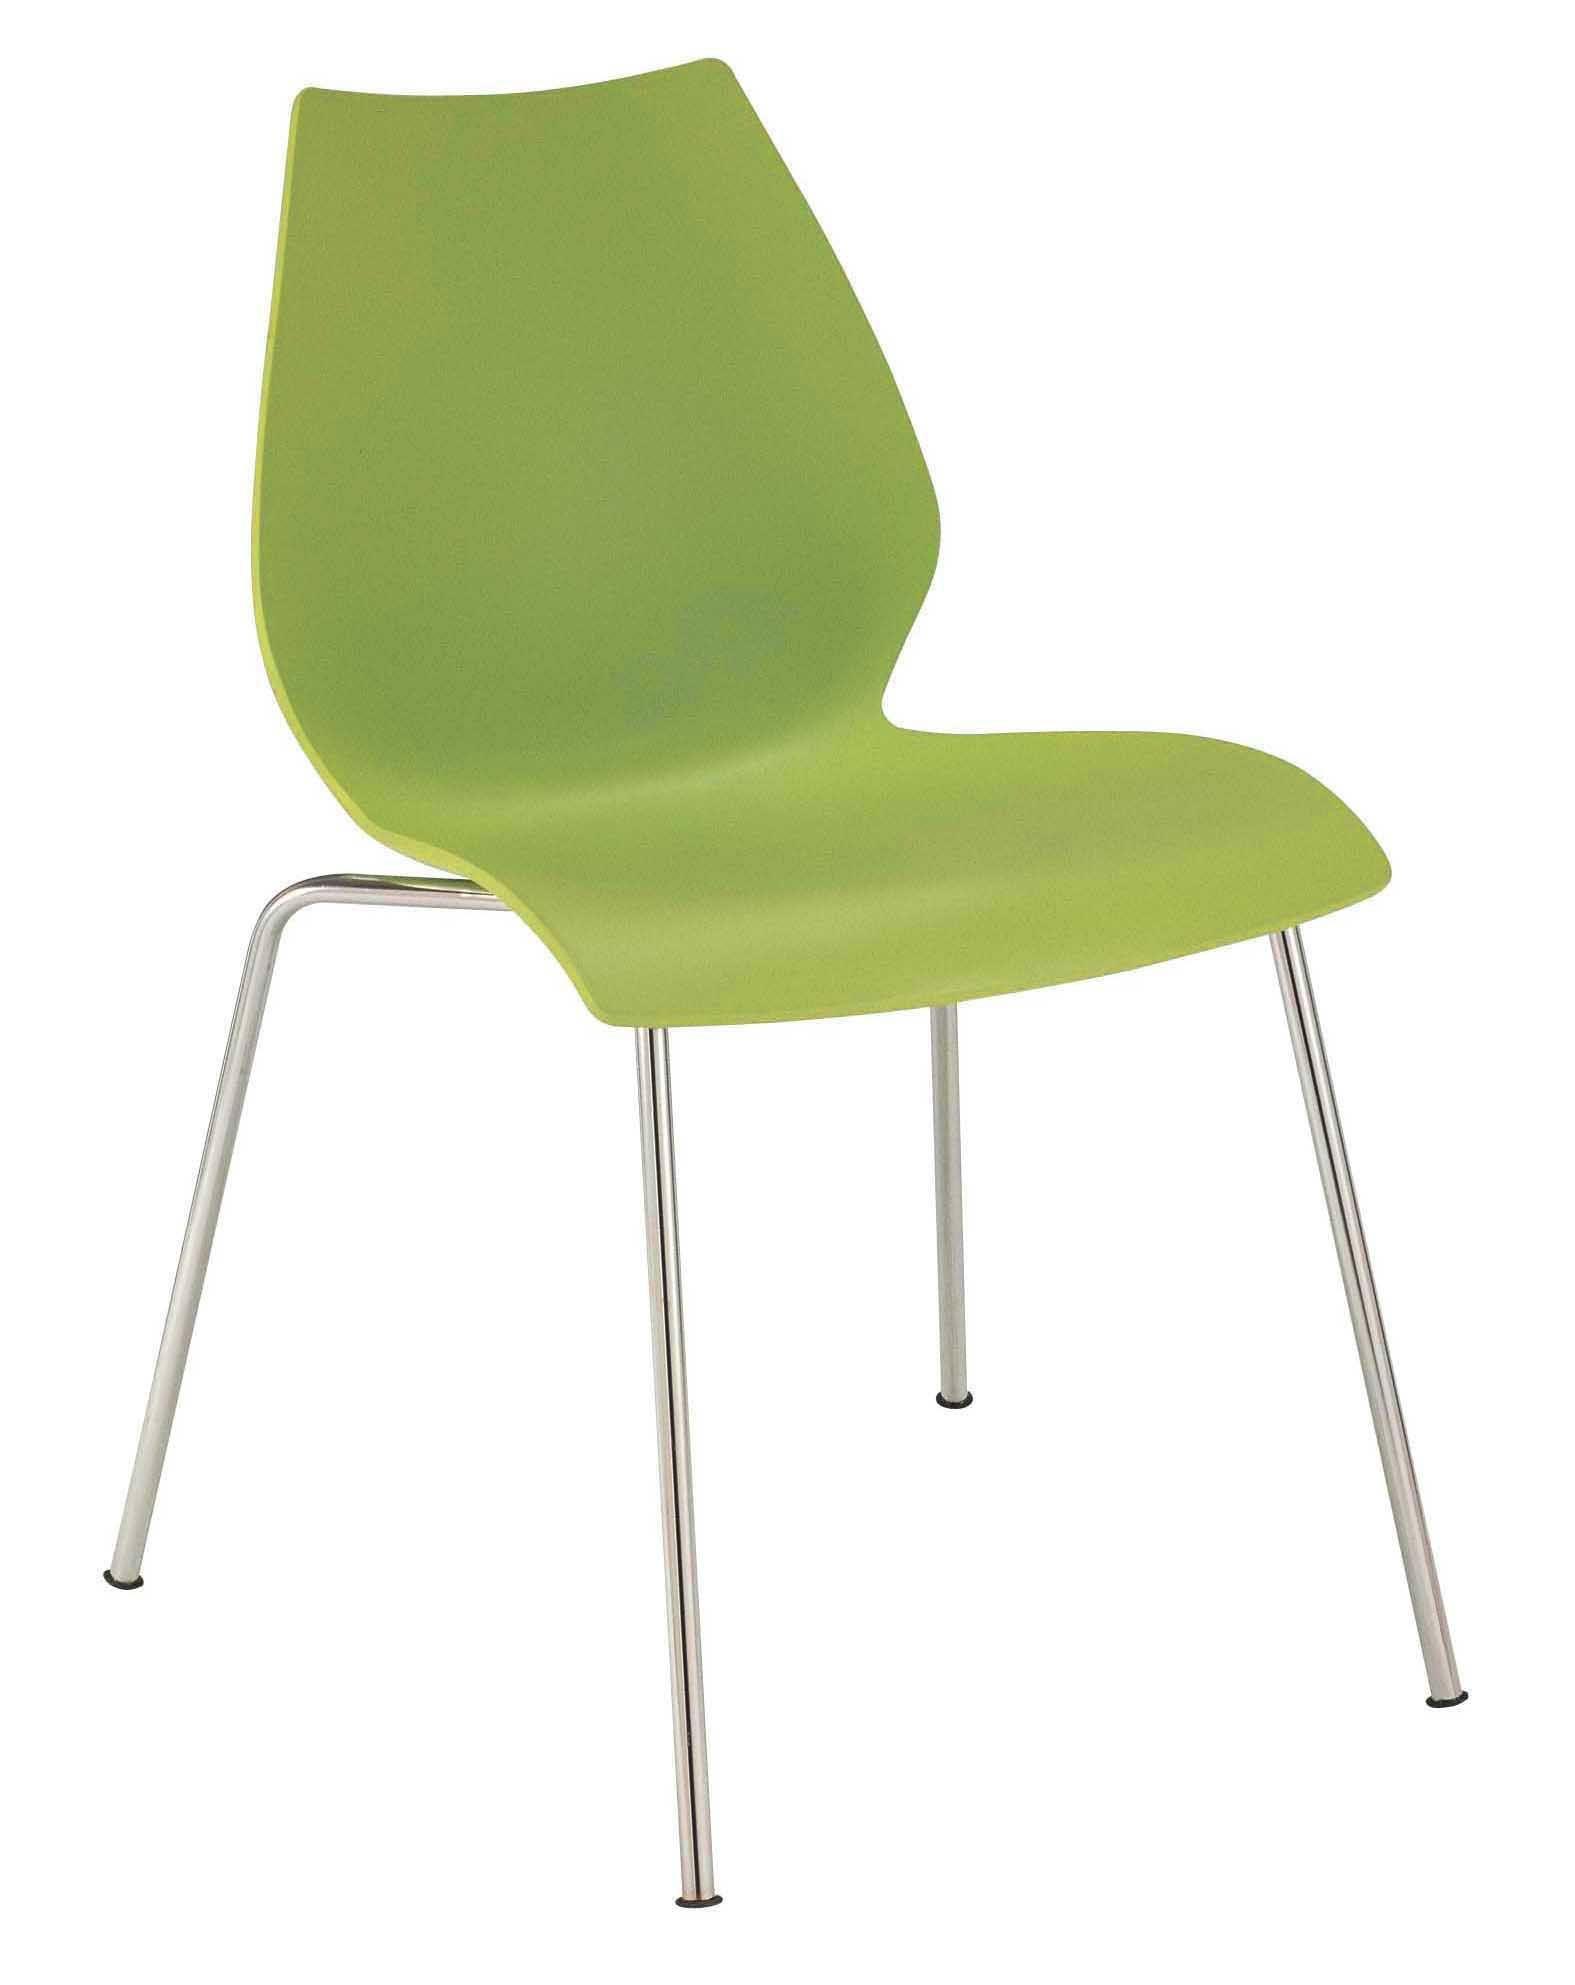 Scopri sedia impilabile maui verde di kartell made in for Sedia design kartell